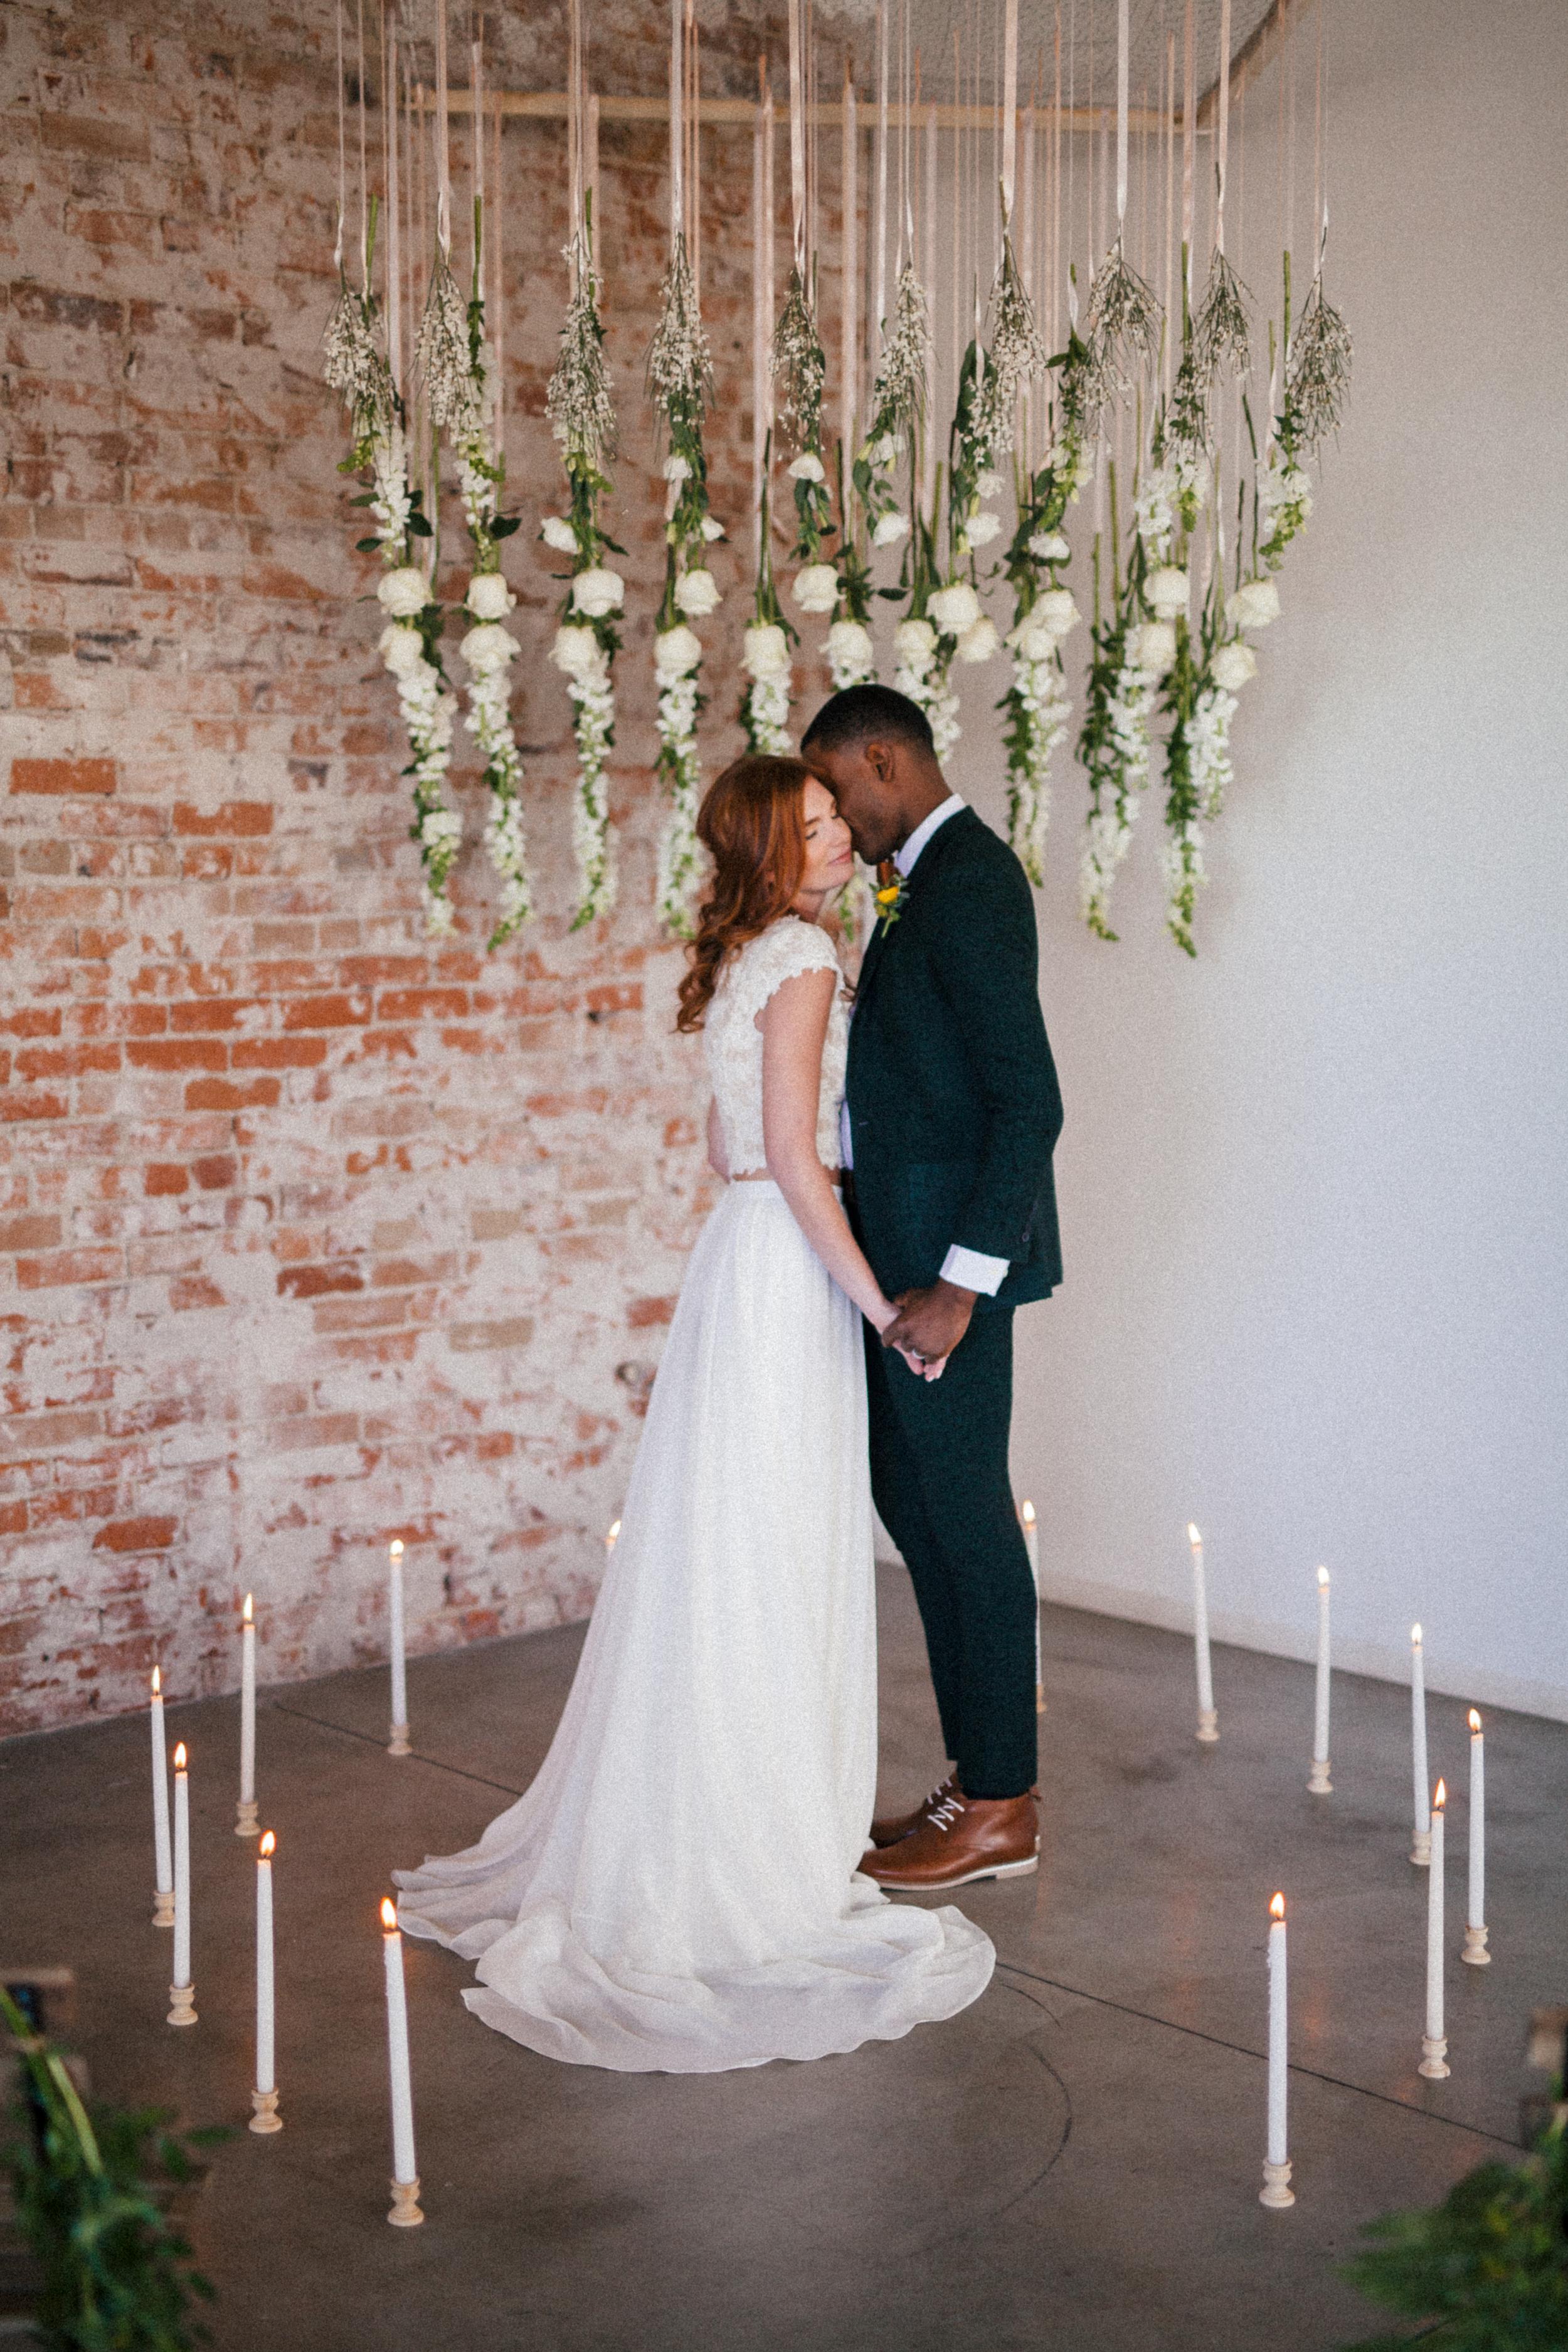 Irish inspired shoot | Sassi Holford top + Charlie Brear skirt from Little White Dress Bridal Shop in Denver | Cassie Rosch Photography